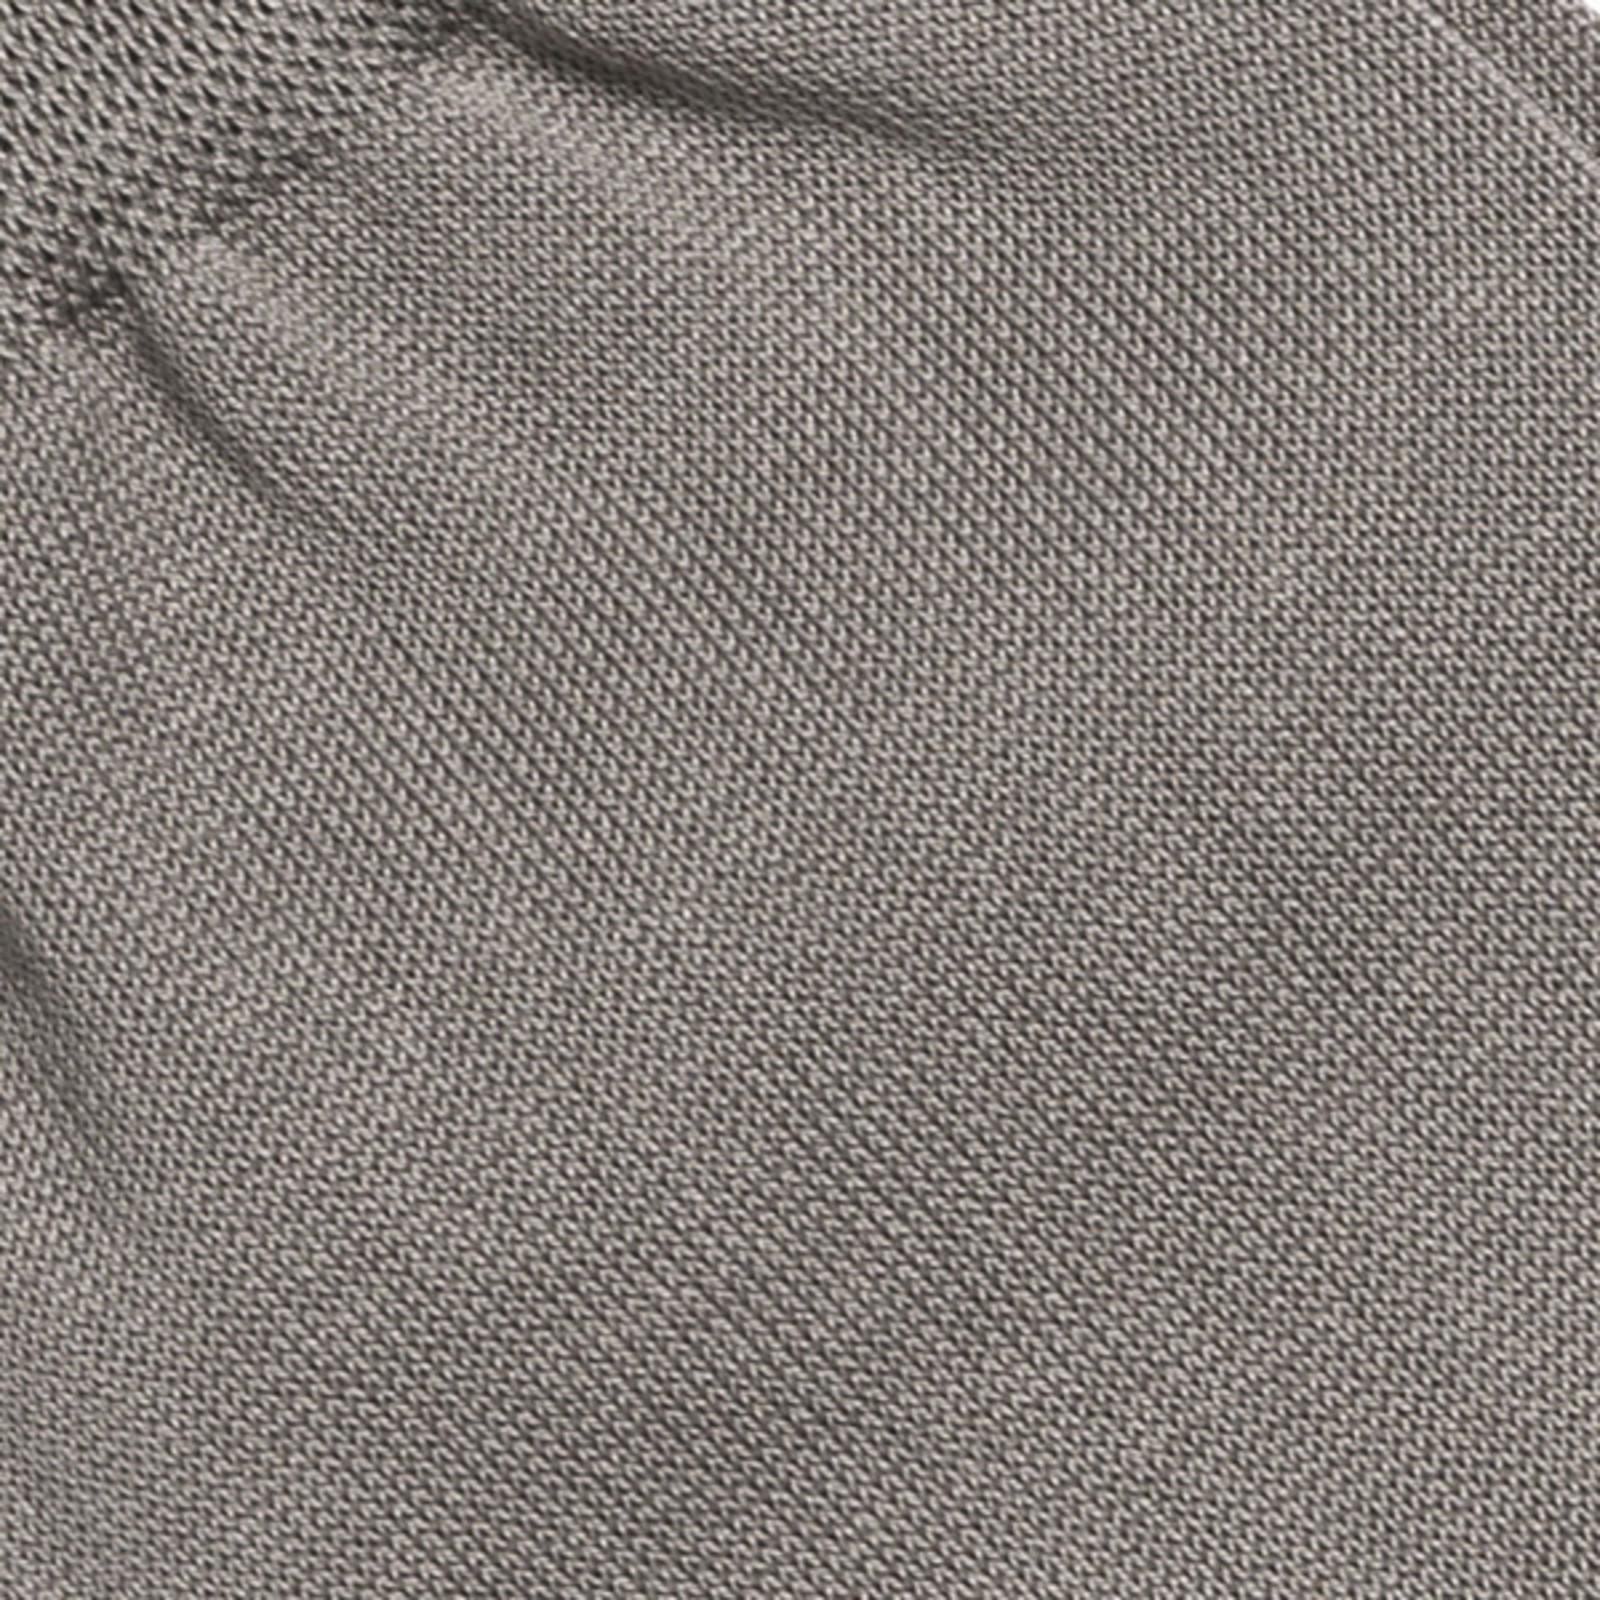 Carlo Lanza Taupe cotton socks